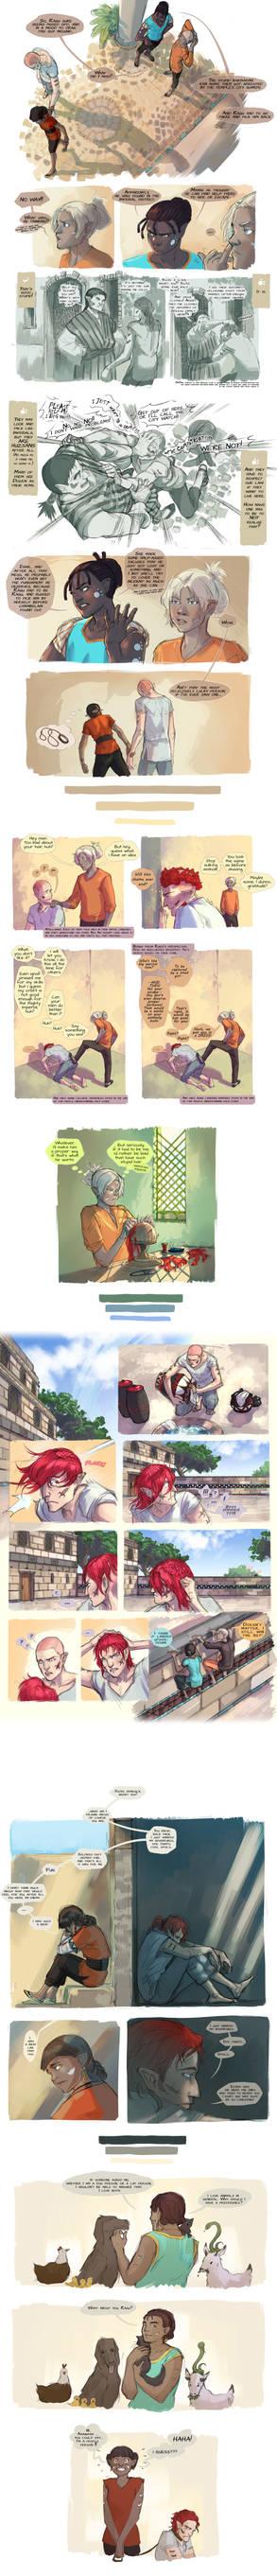 OCAC Comic Compilation